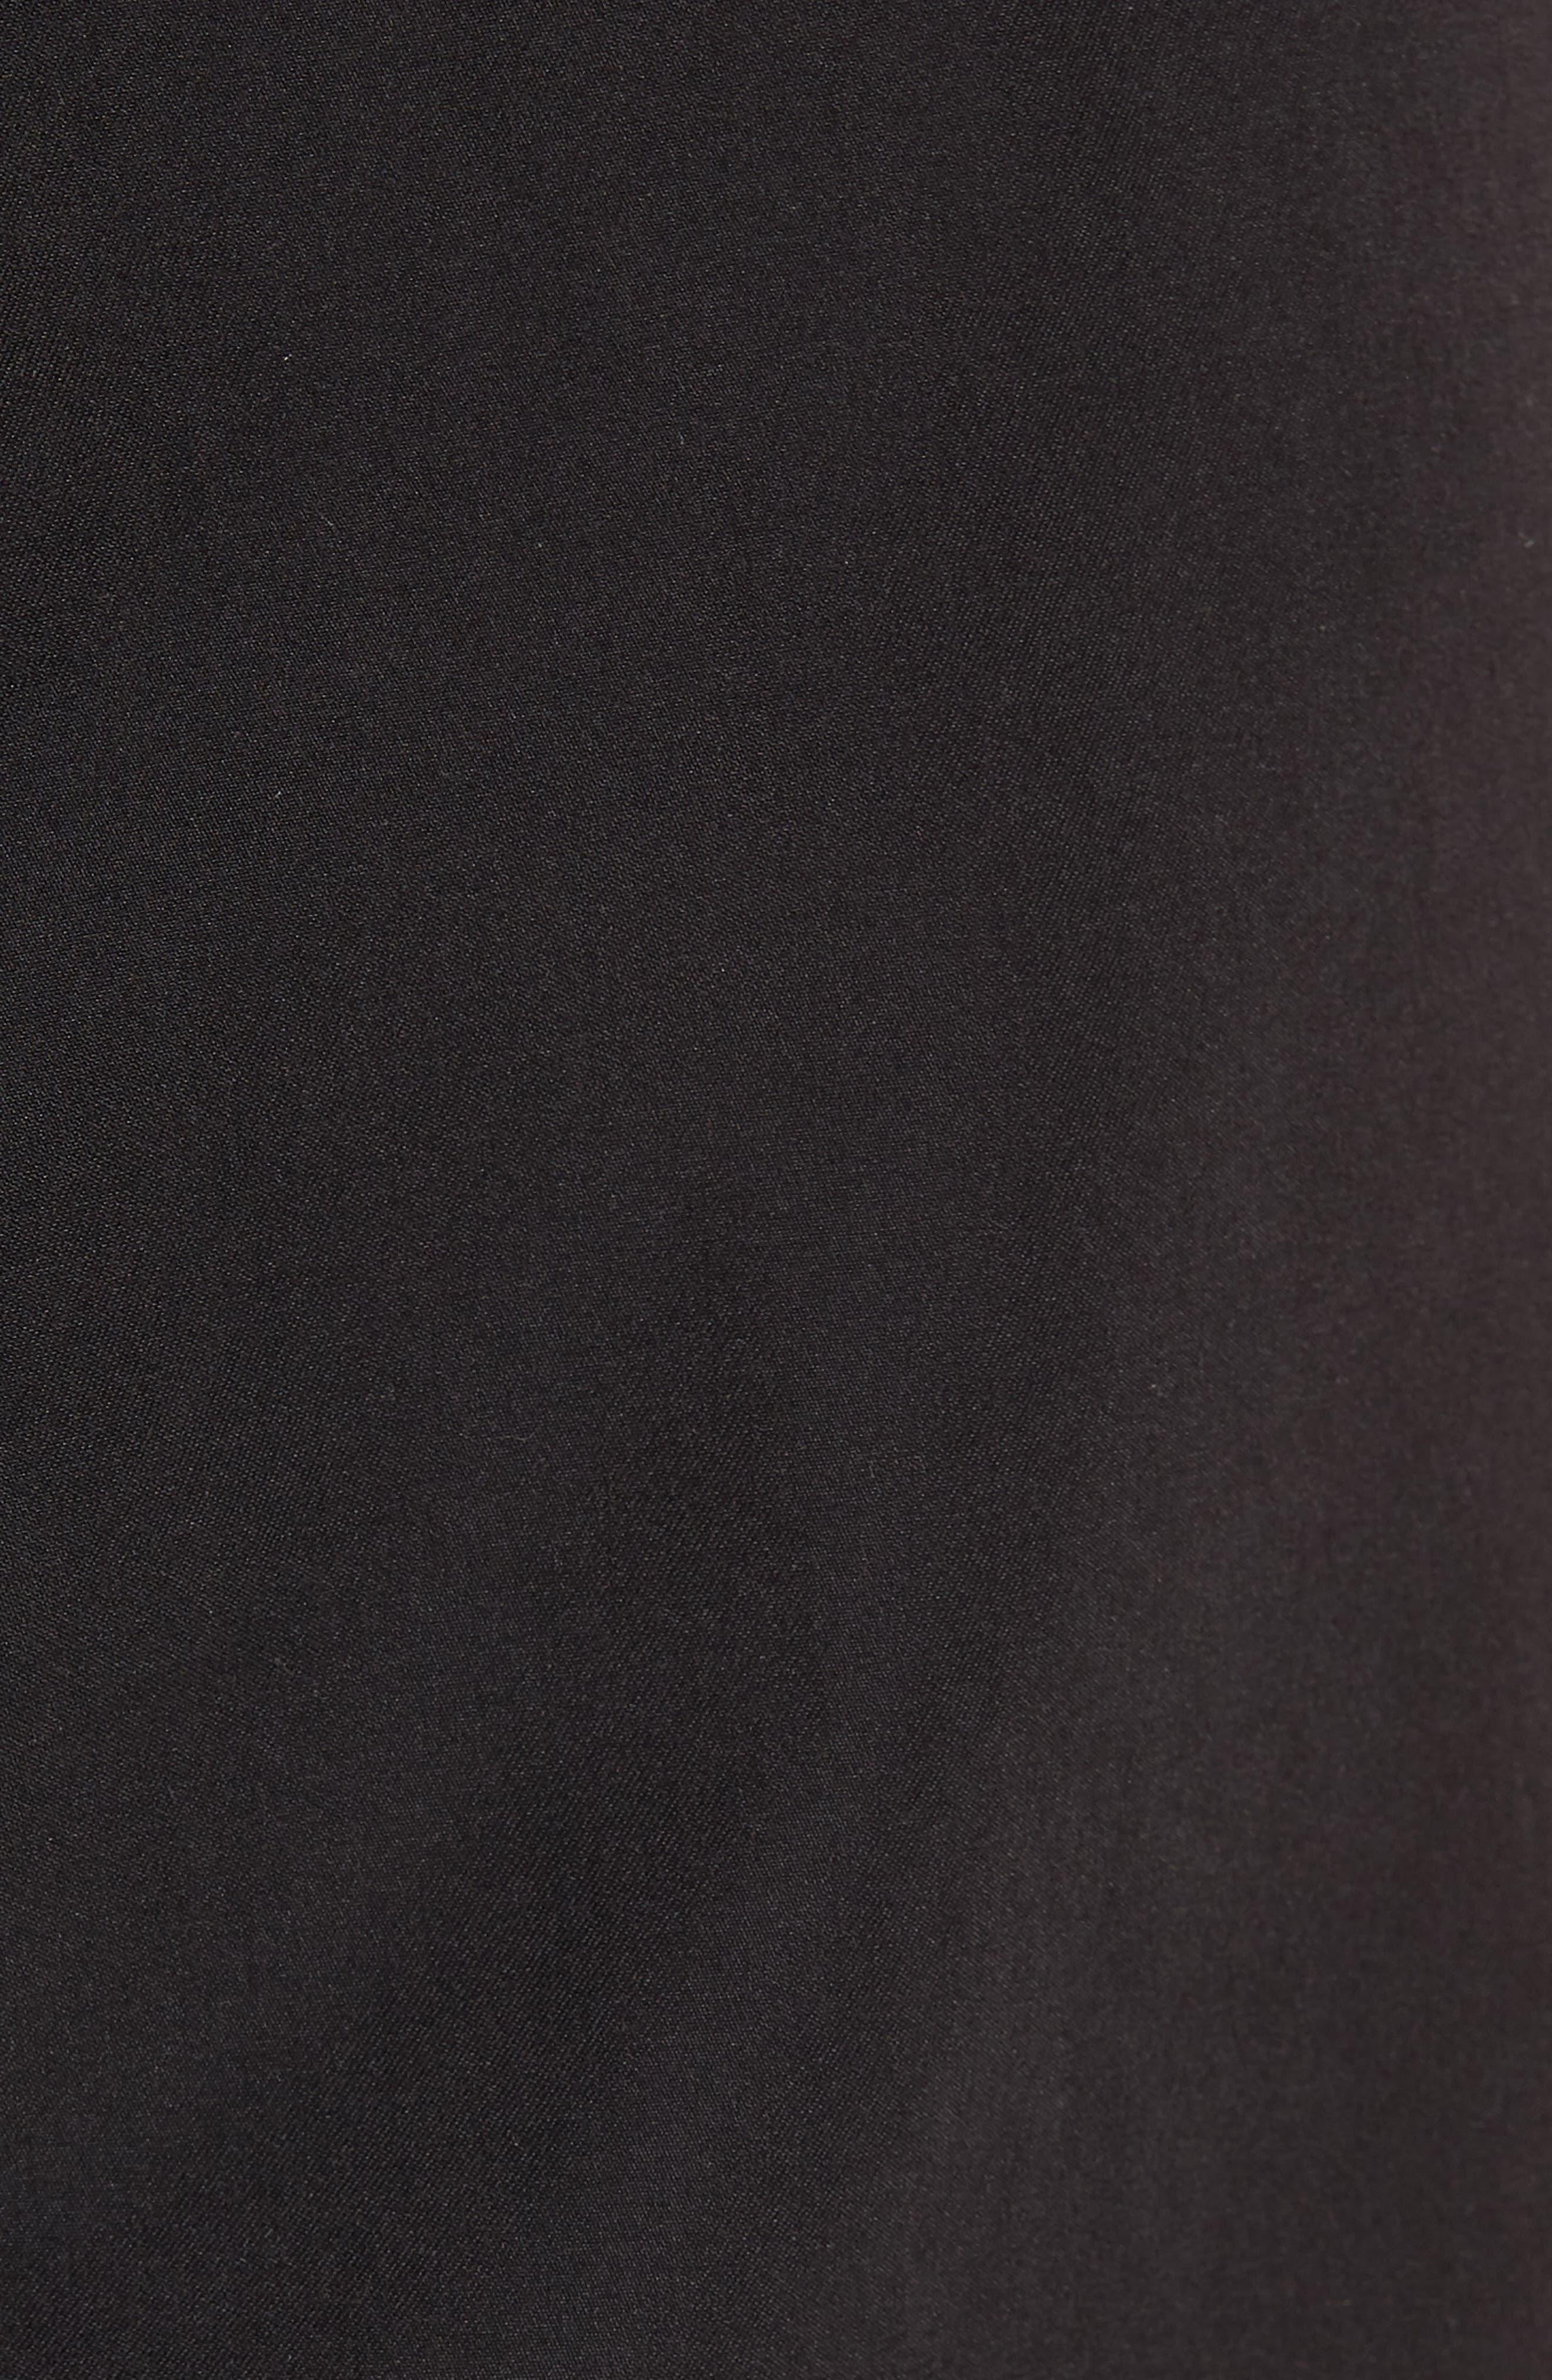 73 OG Board Shorts,                             Alternate thumbnail 5, color,                             Black